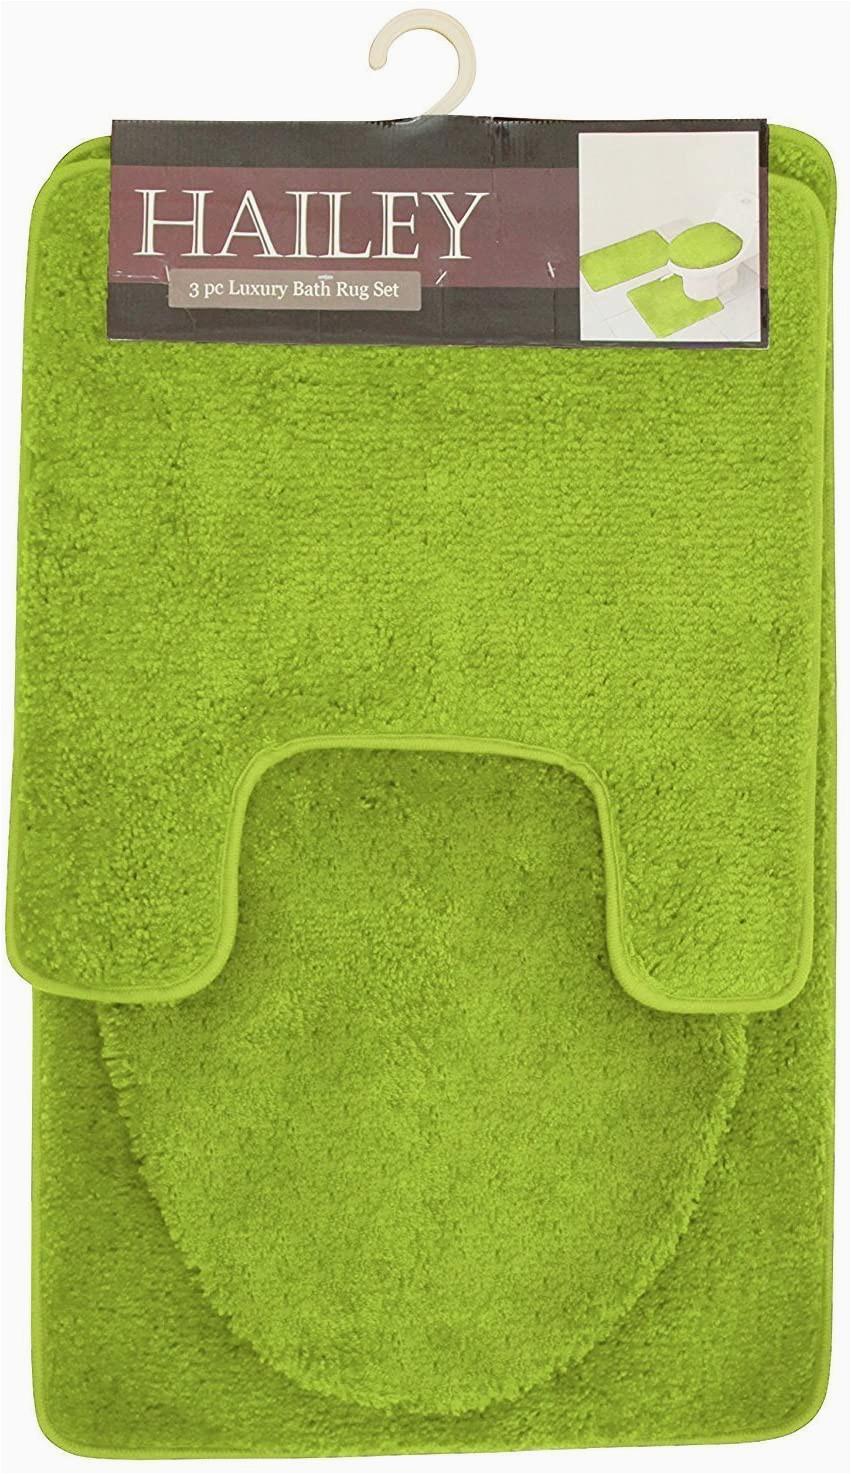 Lime Green Bathroom Rug Sets Hailey 3 Piece Bath Rug Set Lime